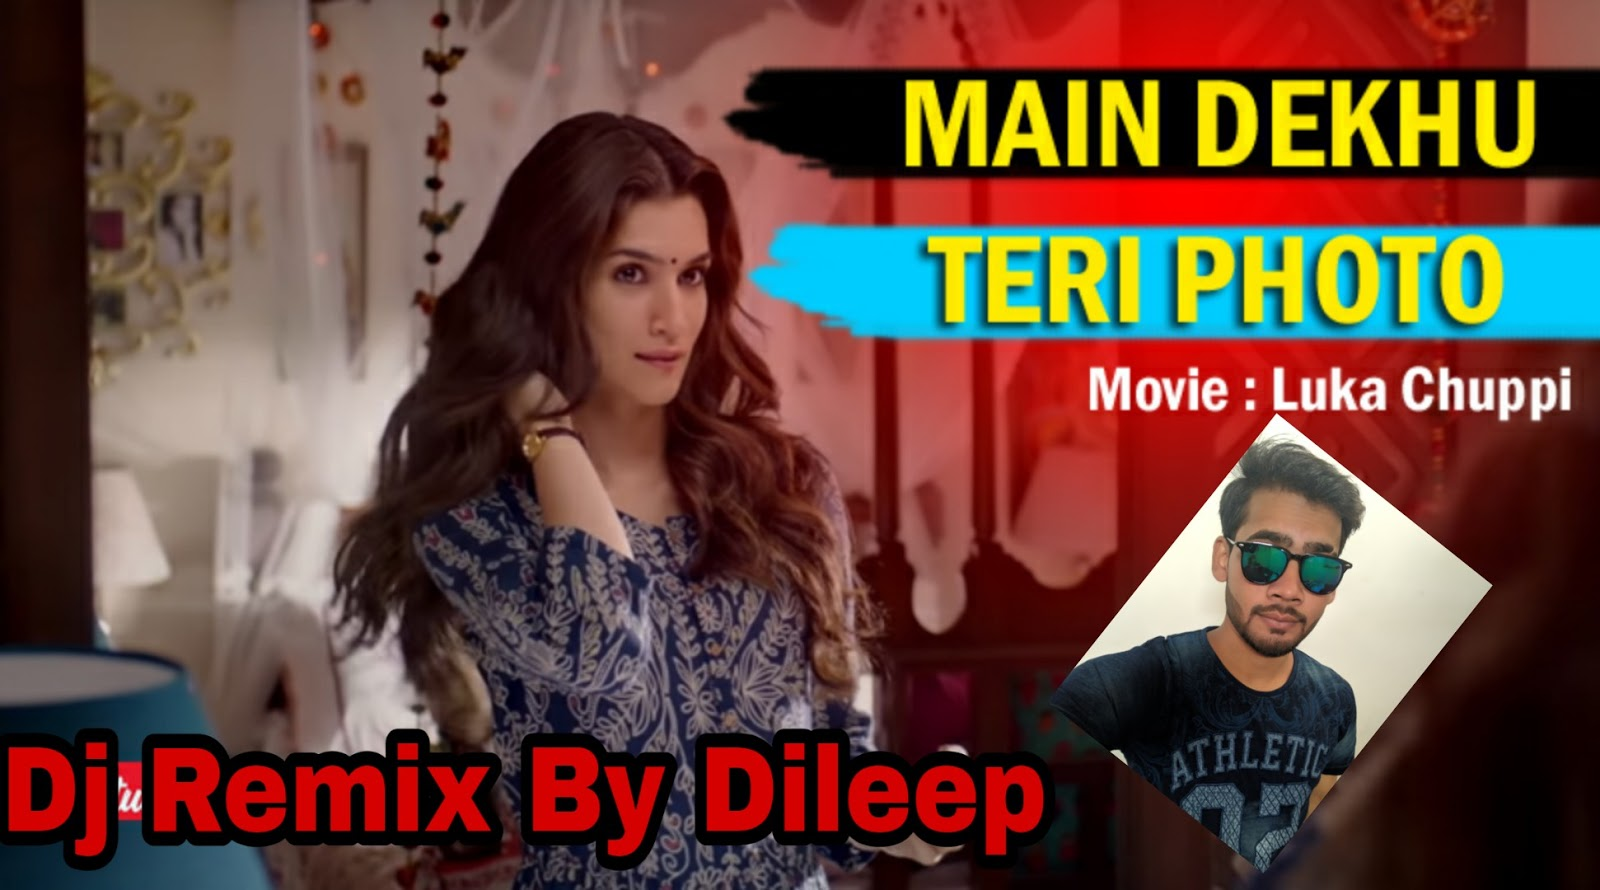 Mai Dekhu Teri Photo Dj Remix Song Romantic Dj Song Remix By Dj